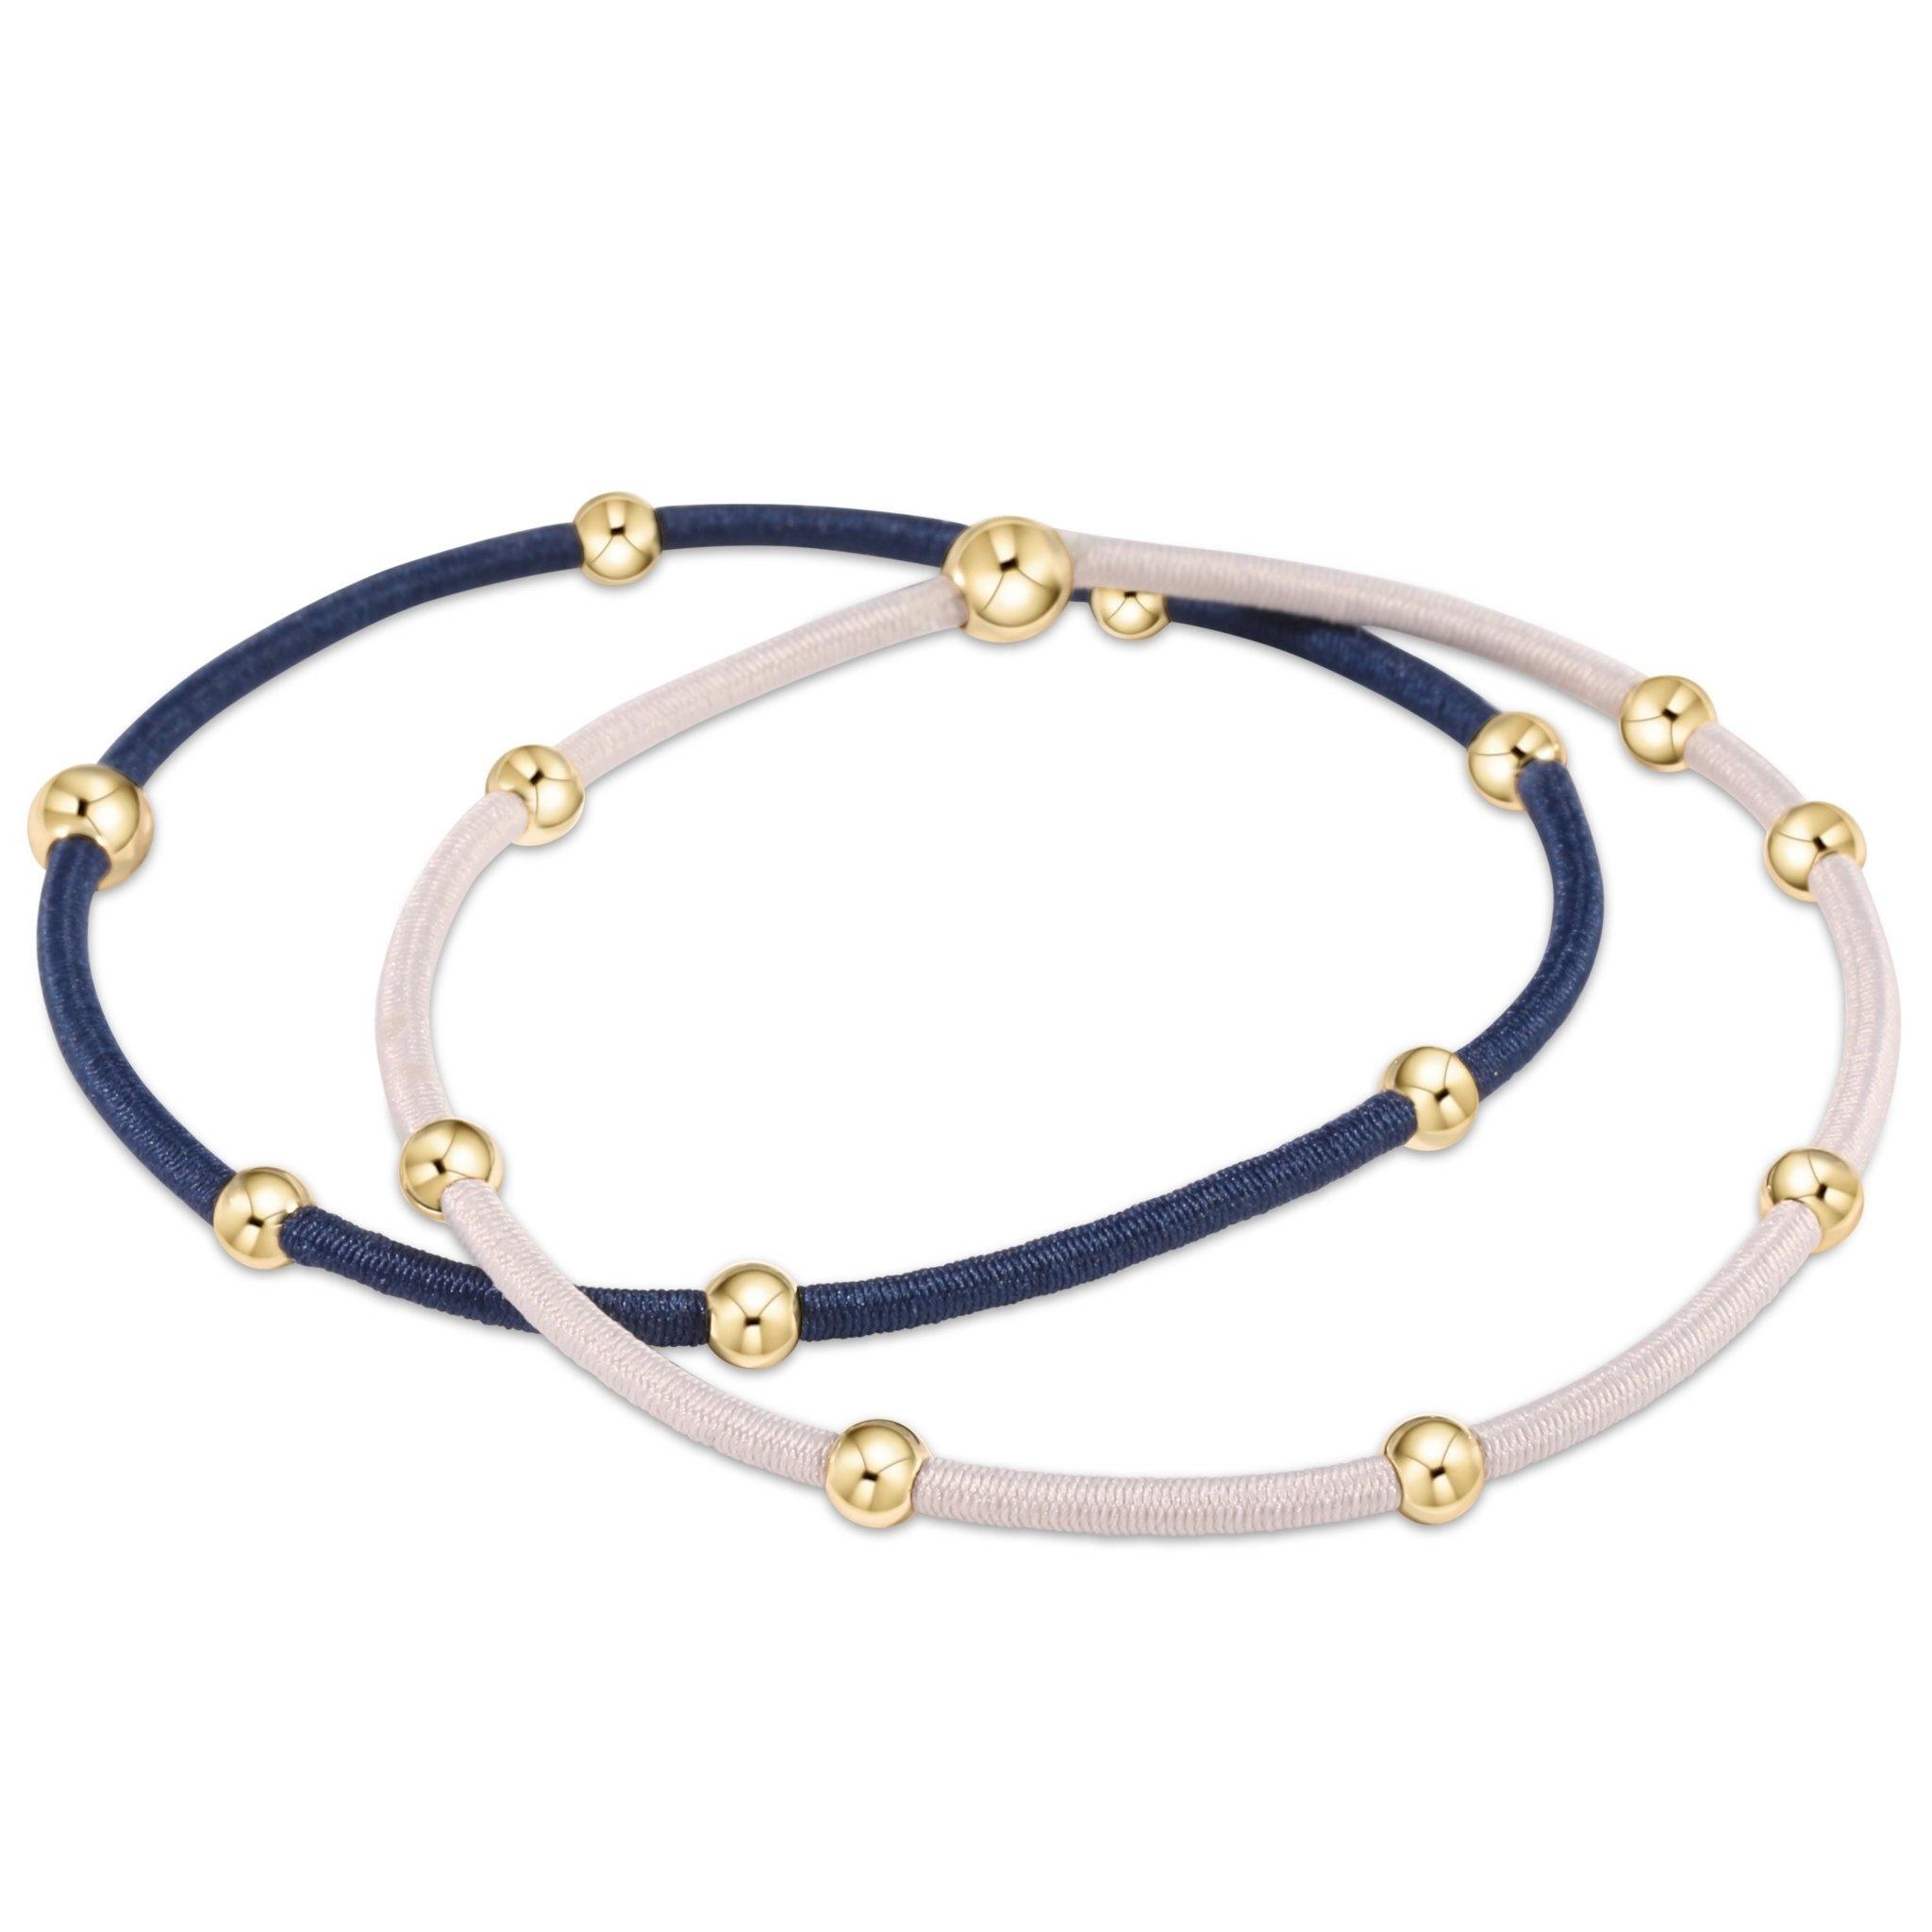 ENEWTON e ssentials bracelet stack of 2-Midnight